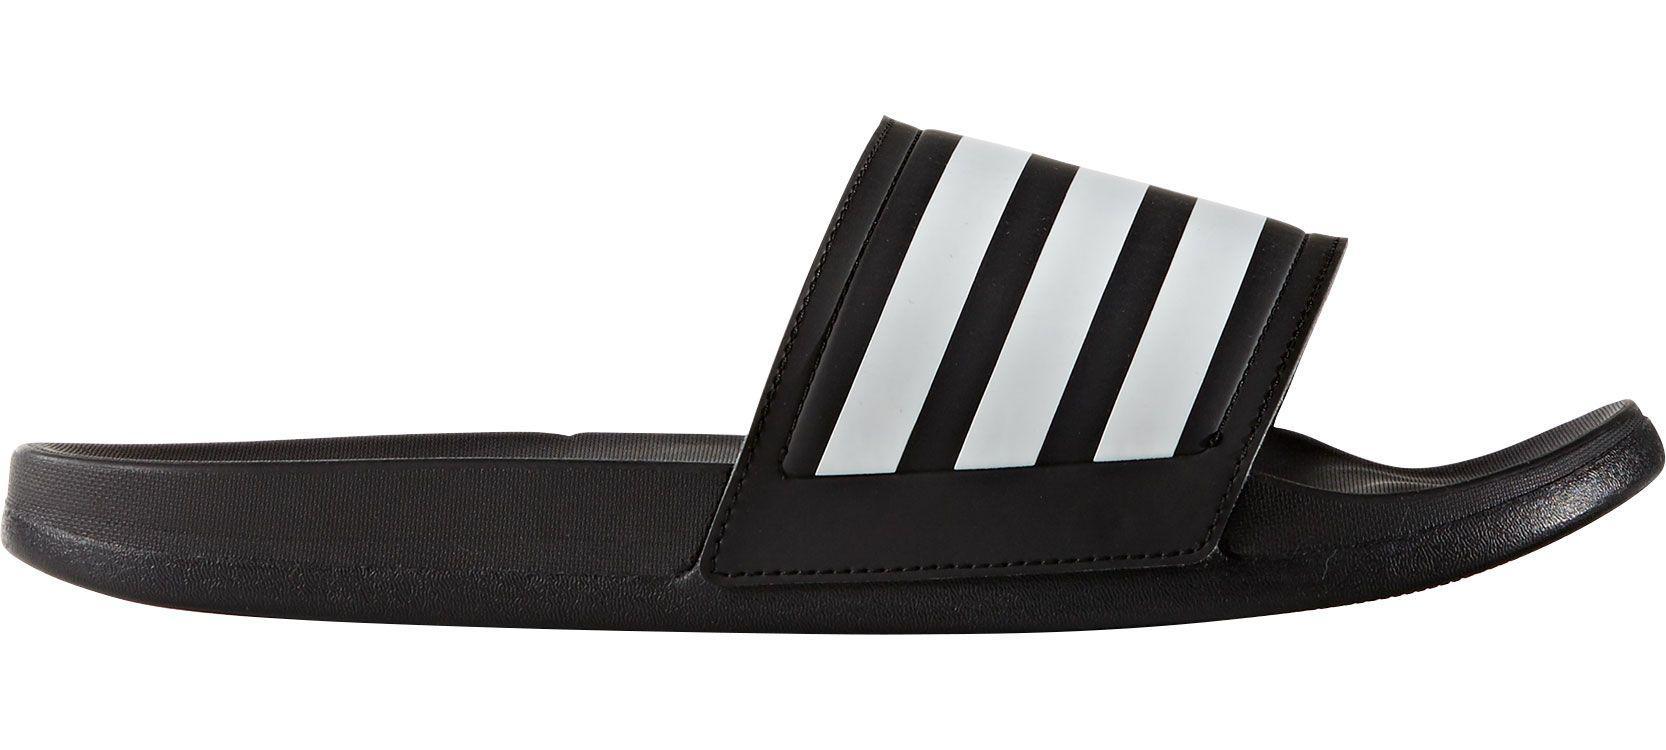 1b0d822cec4621 Lyst - Adidas Adilette Ultra Slides in Black for Men - Save ...